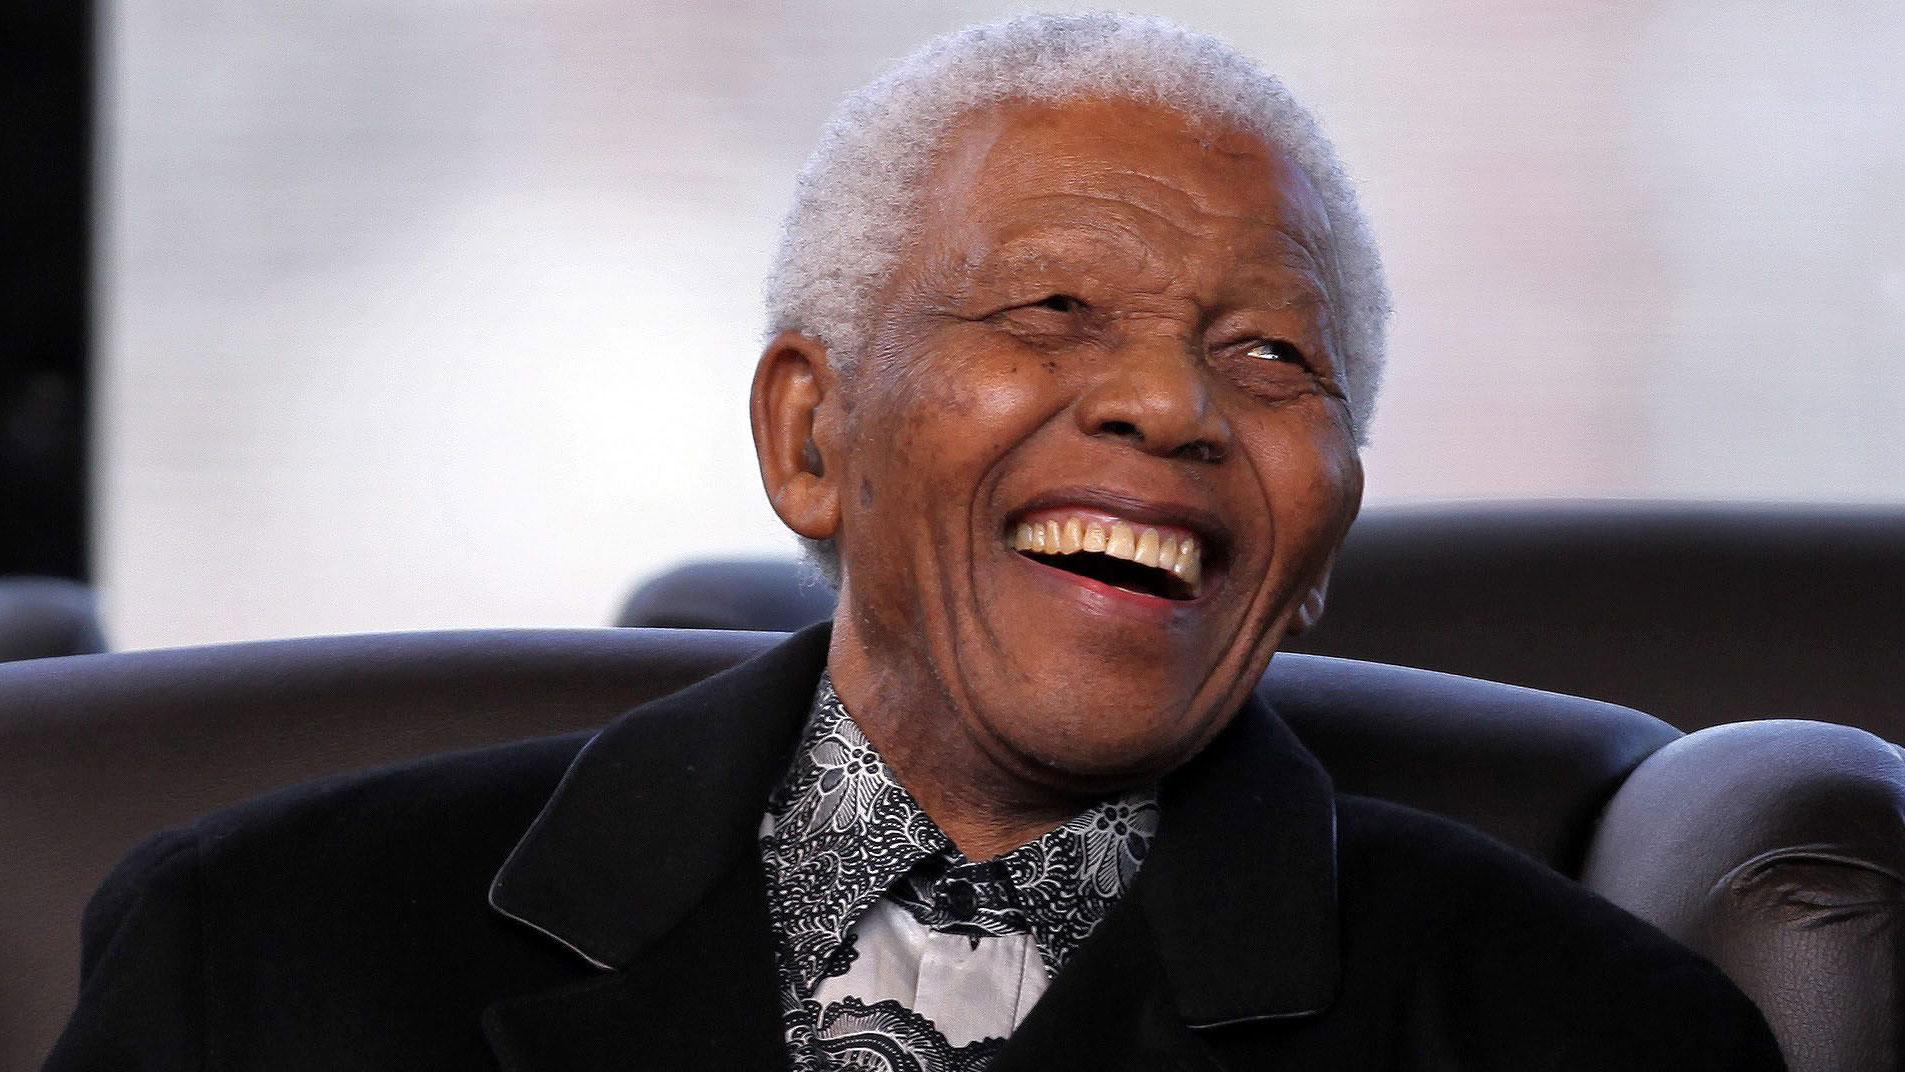 Ysis Of Nelson Mandelas Inauguration Speech